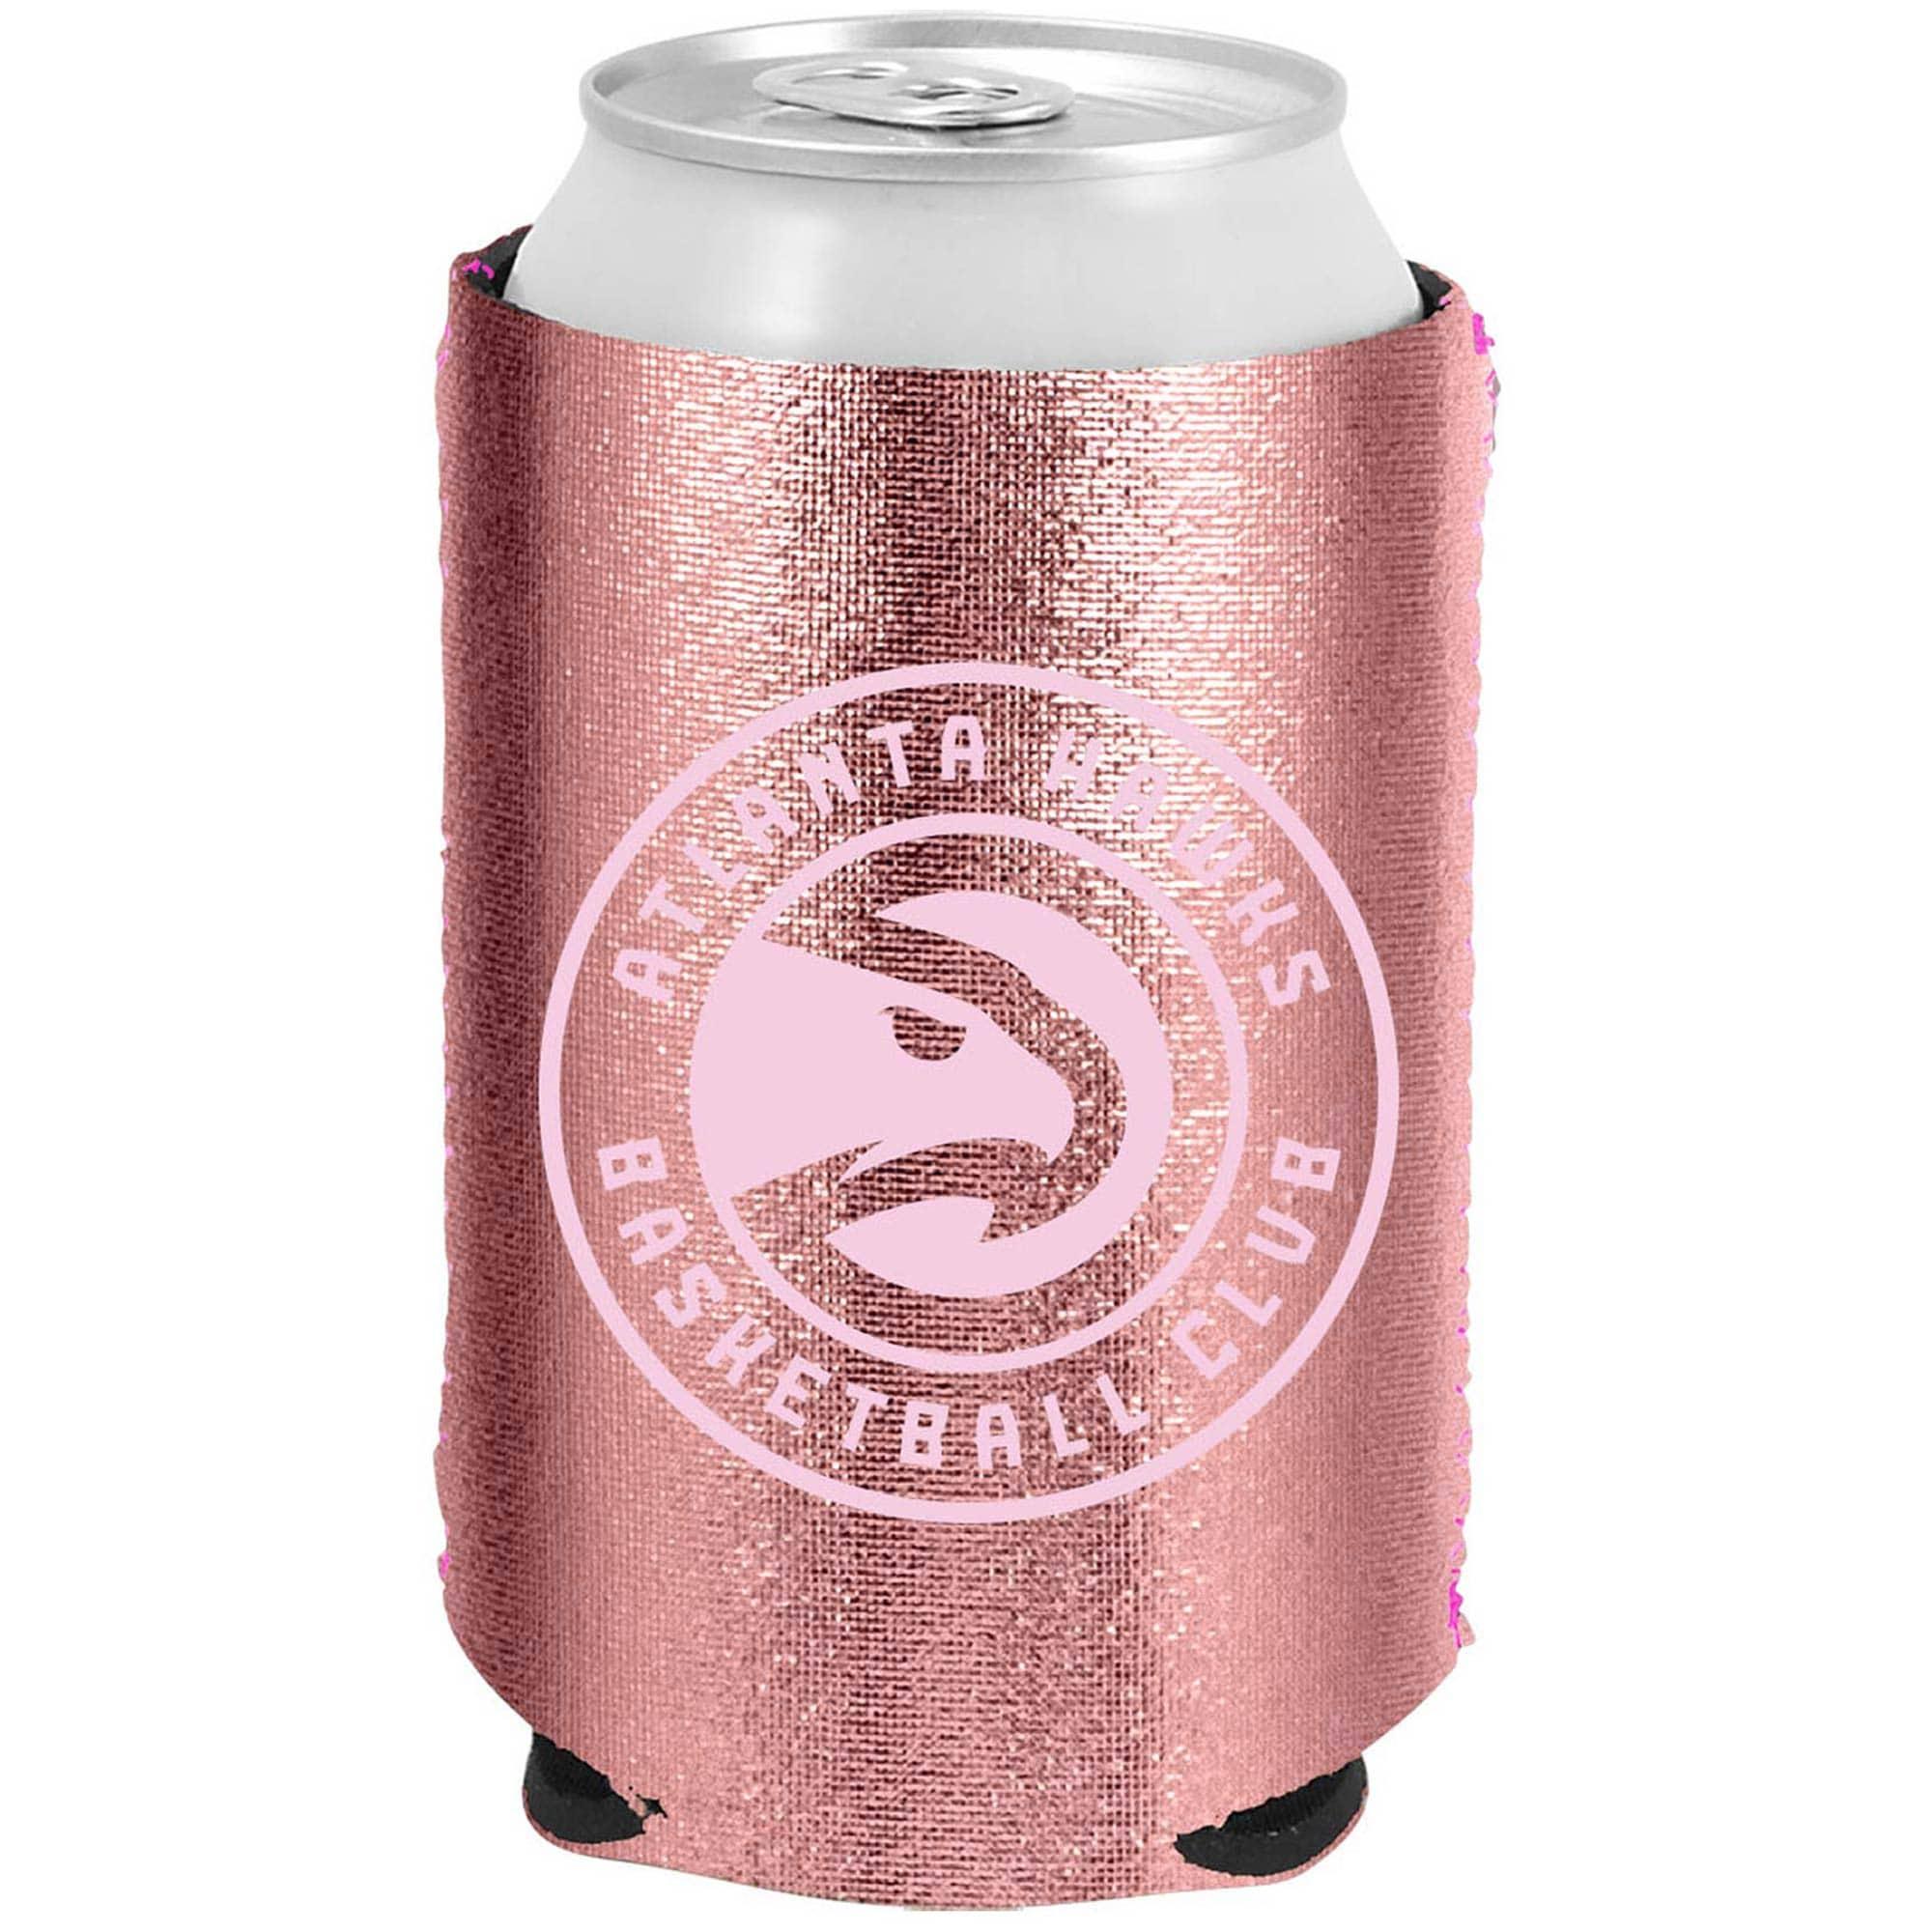 Atlanta Hawks 12oz. Rose Gold Can Cooler